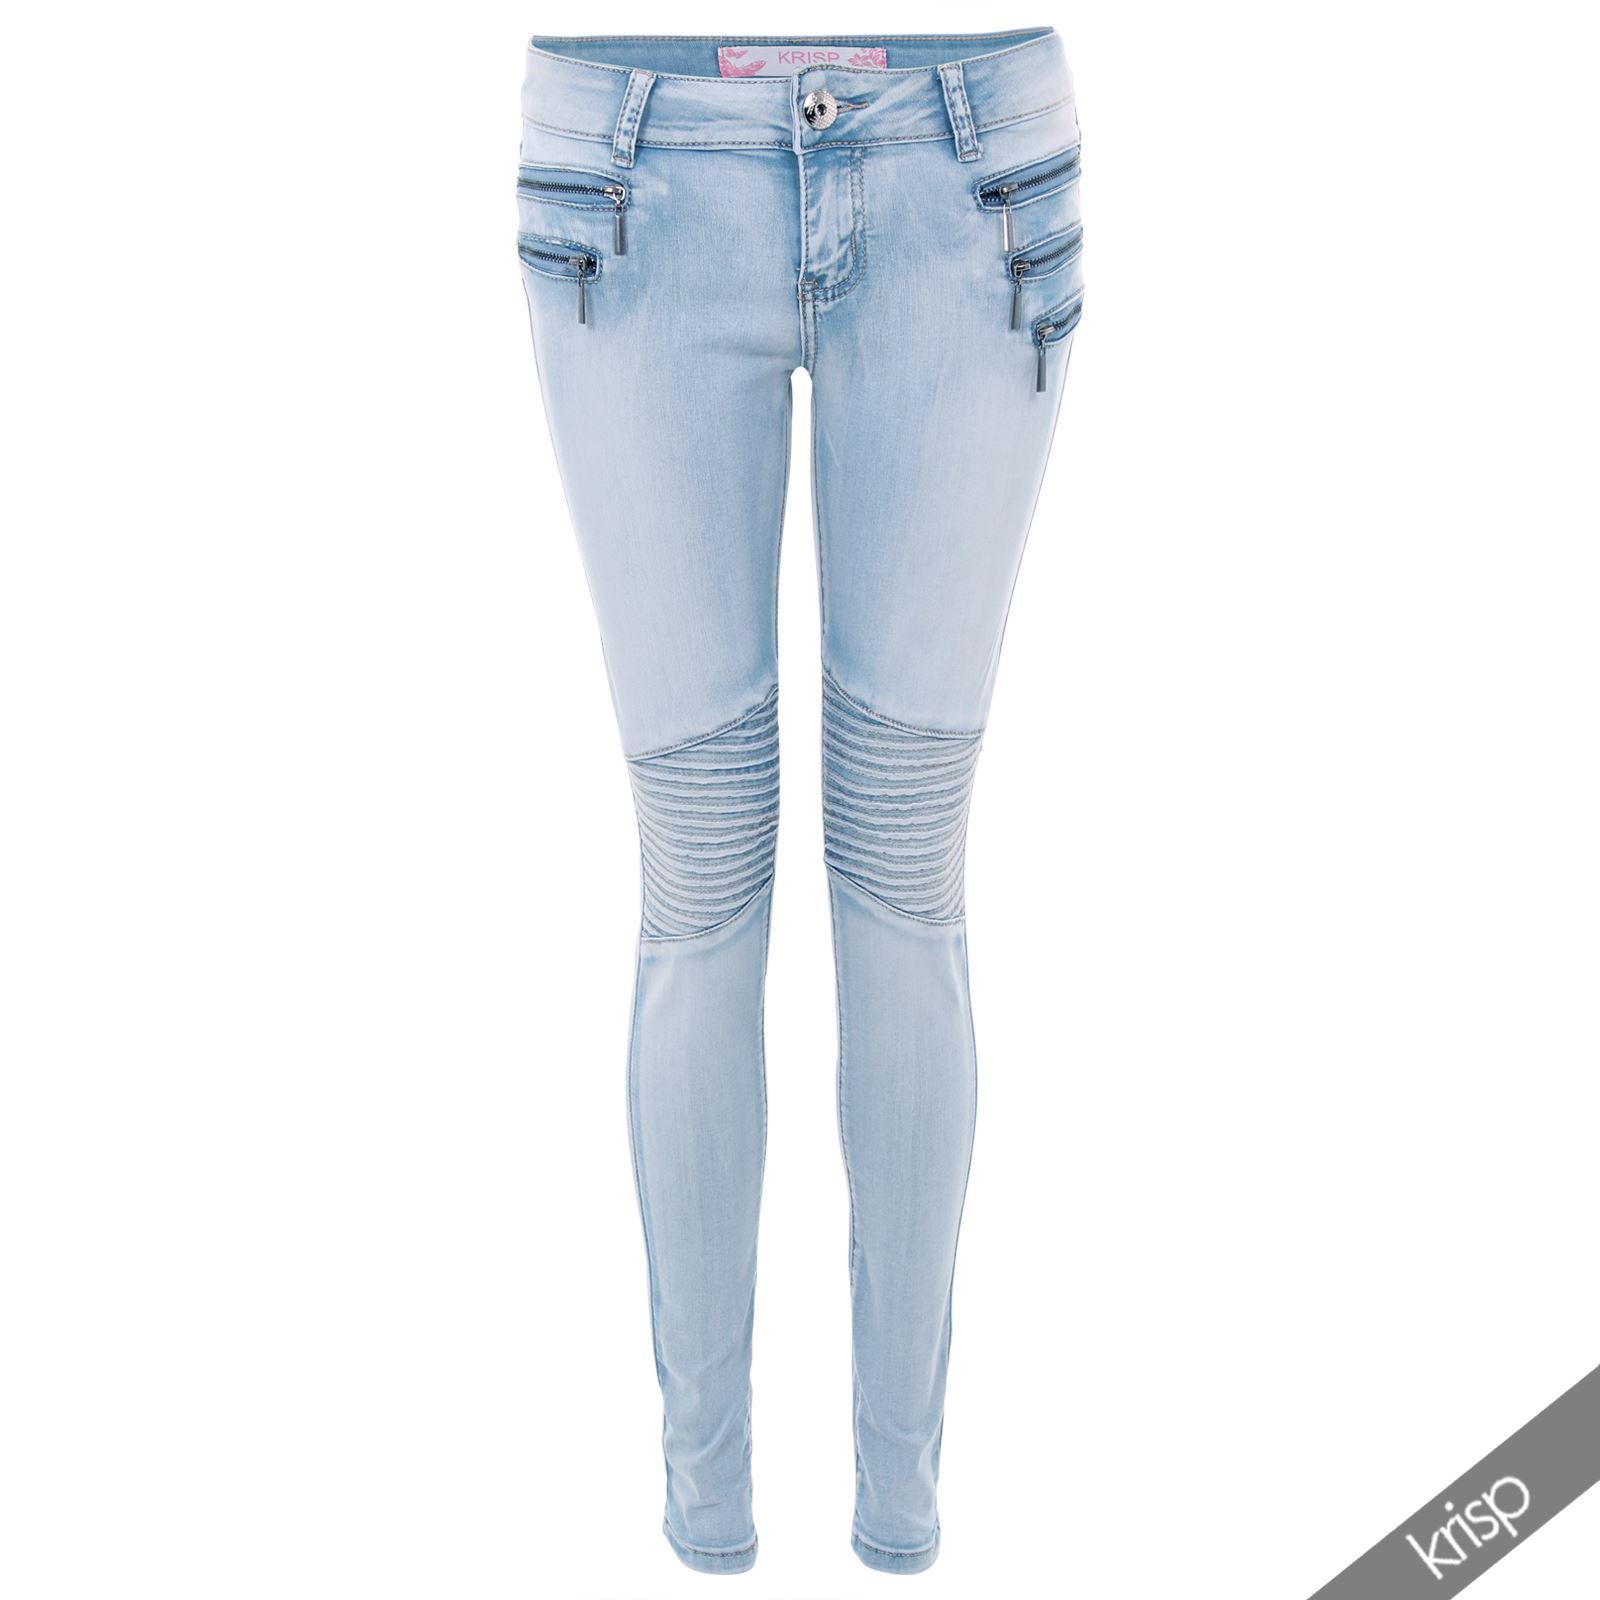 damen skinny jeans reisverschlusse steppnahte stretch denim leggings. Black Bedroom Furniture Sets. Home Design Ideas